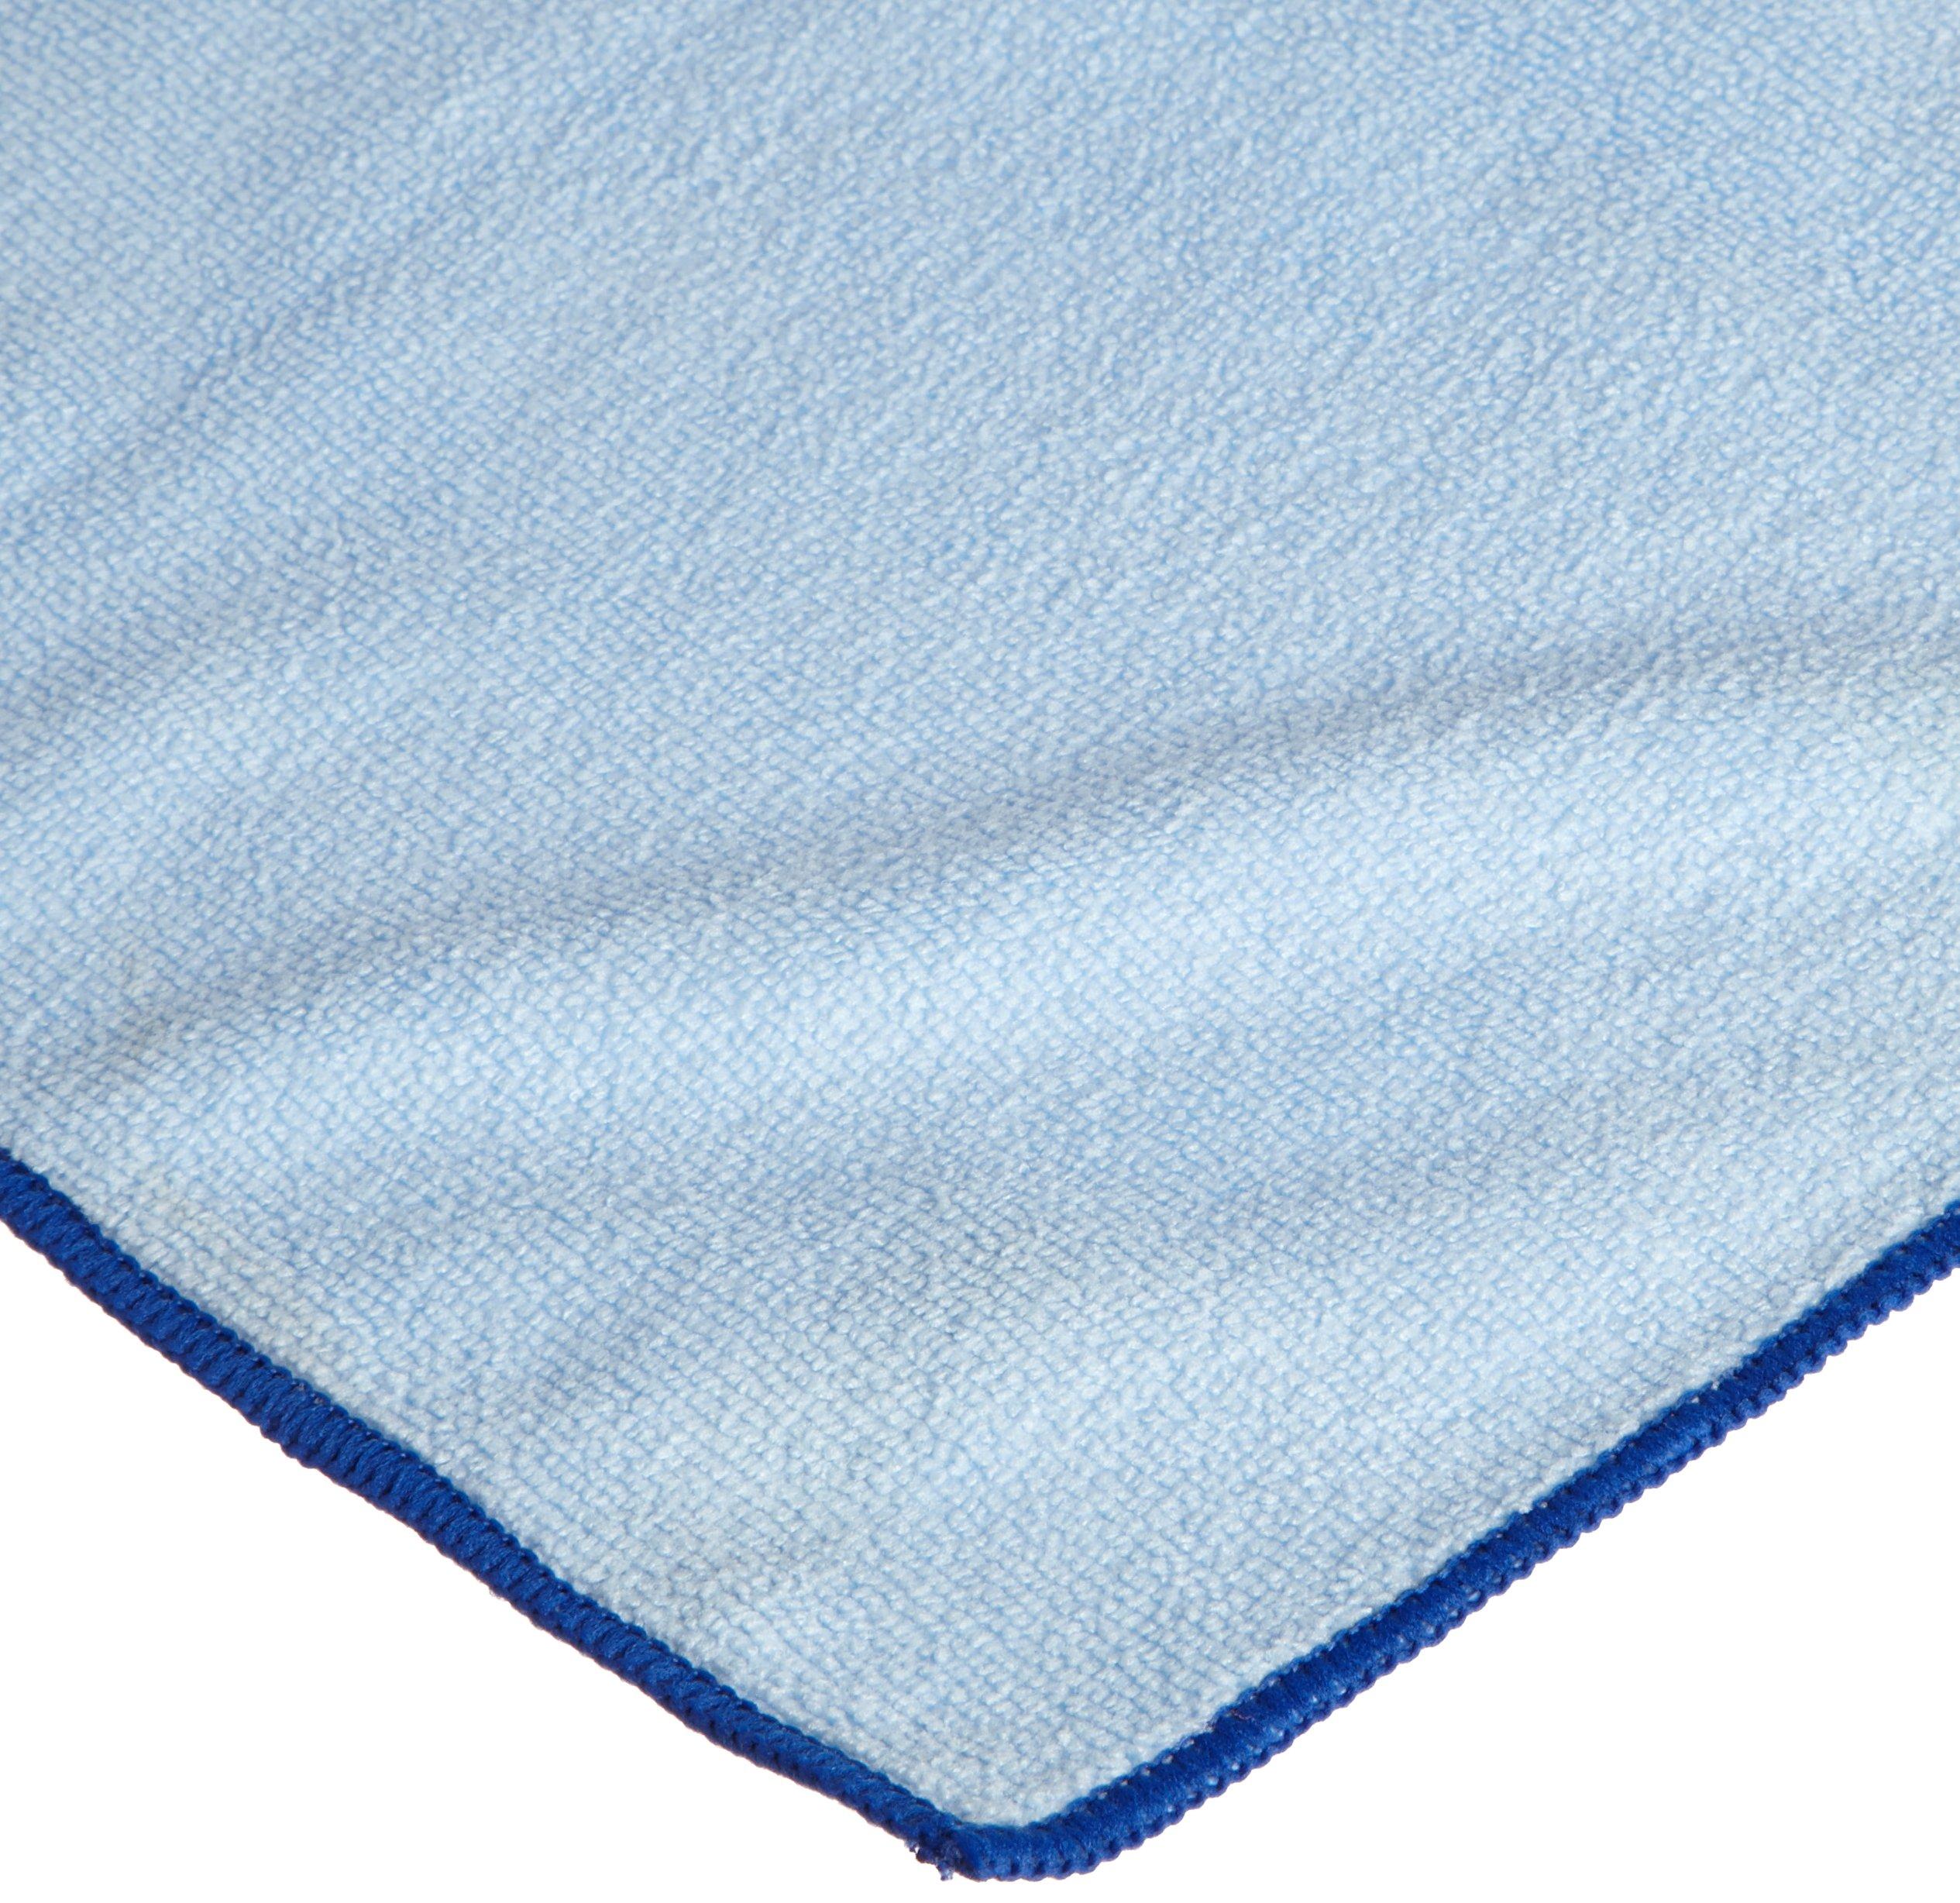 CPI MCLOTH300 B Heavy Duty Microfiber Cloth, 16-Inch x 16-Inch, Blue (Pack of 12)